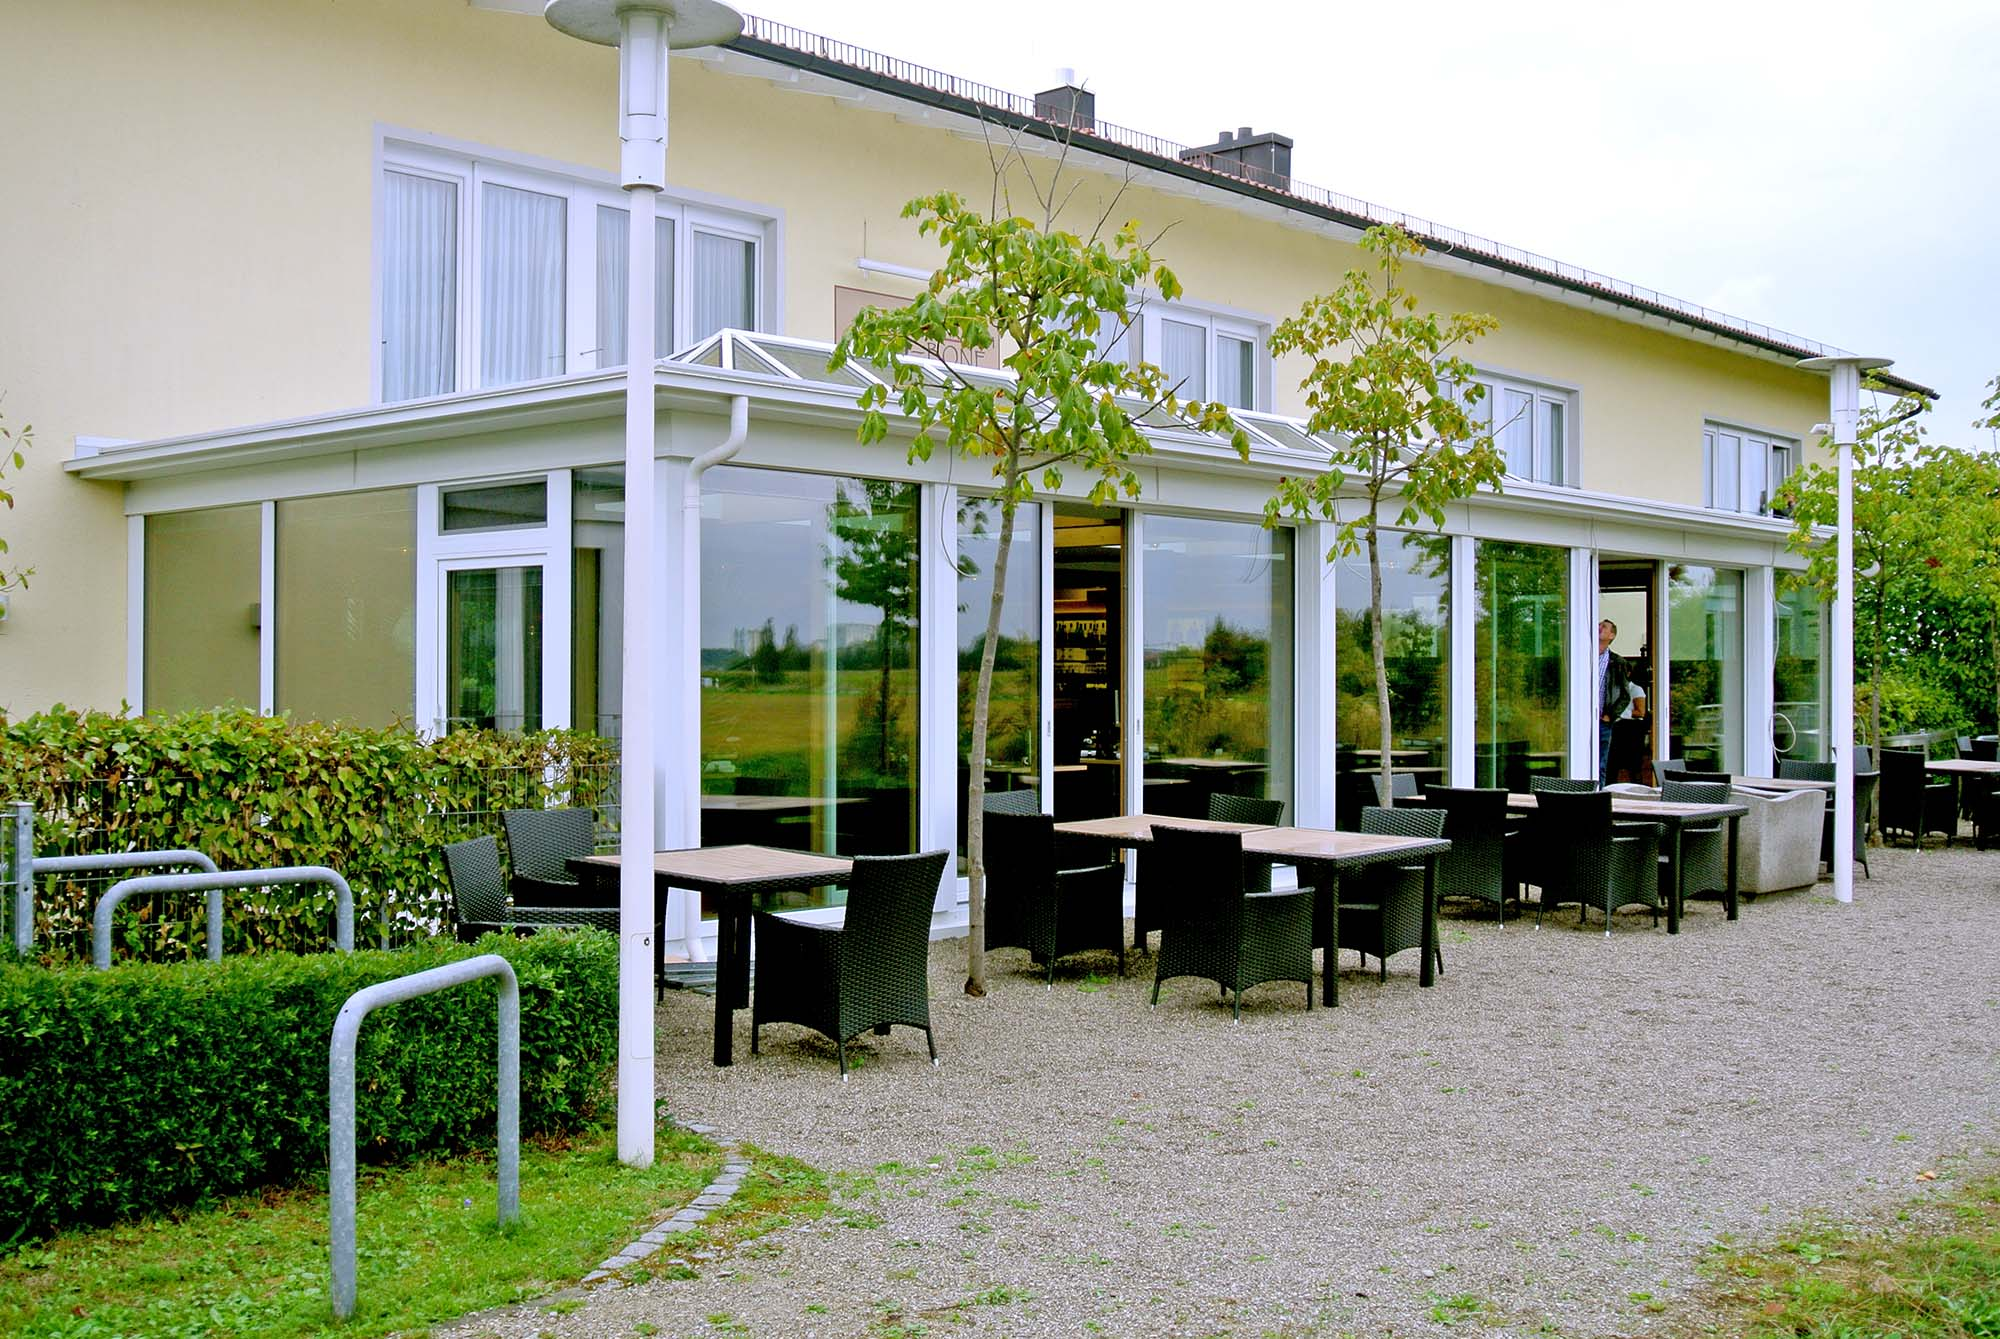 gastronomie wintergarten binnen 2 wochen. Black Bedroom Furniture Sets. Home Design Ideas